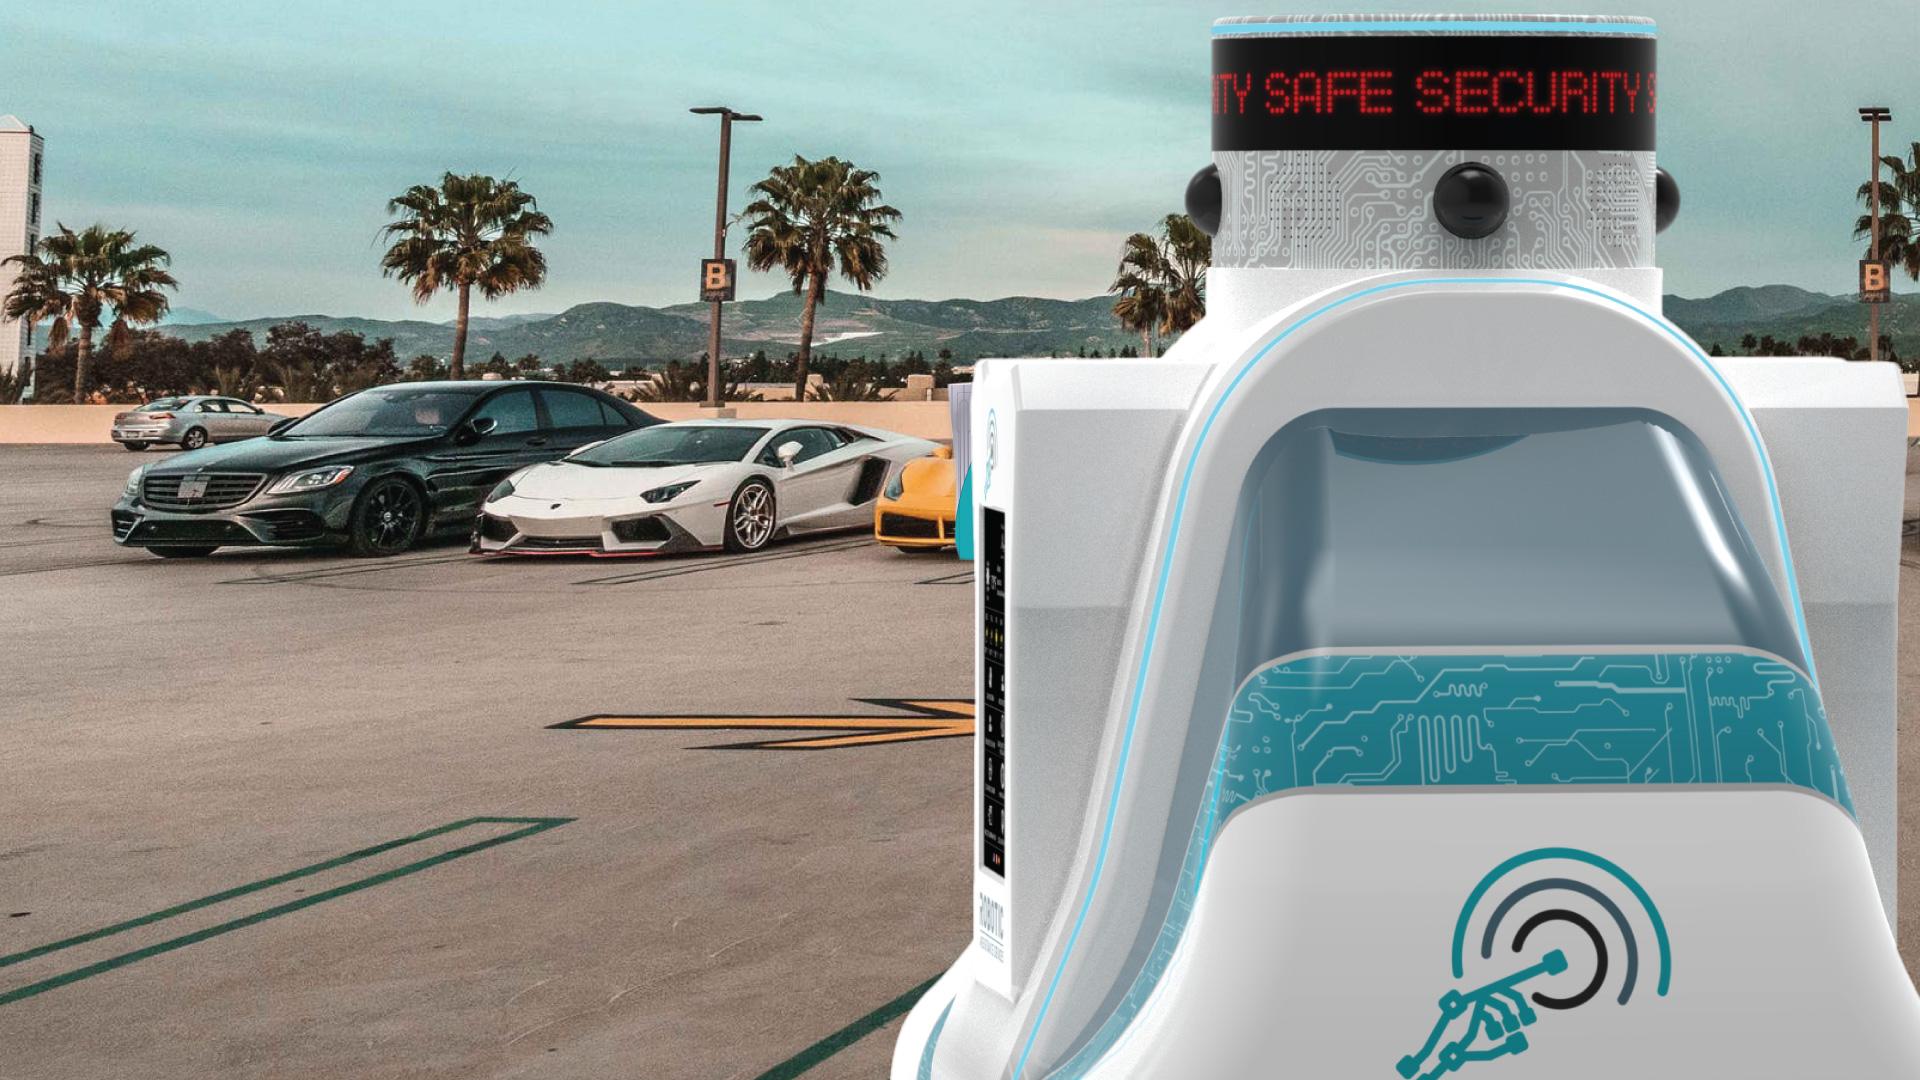 ars vs man guarding luxury car parking lot 2 1920x1080 1